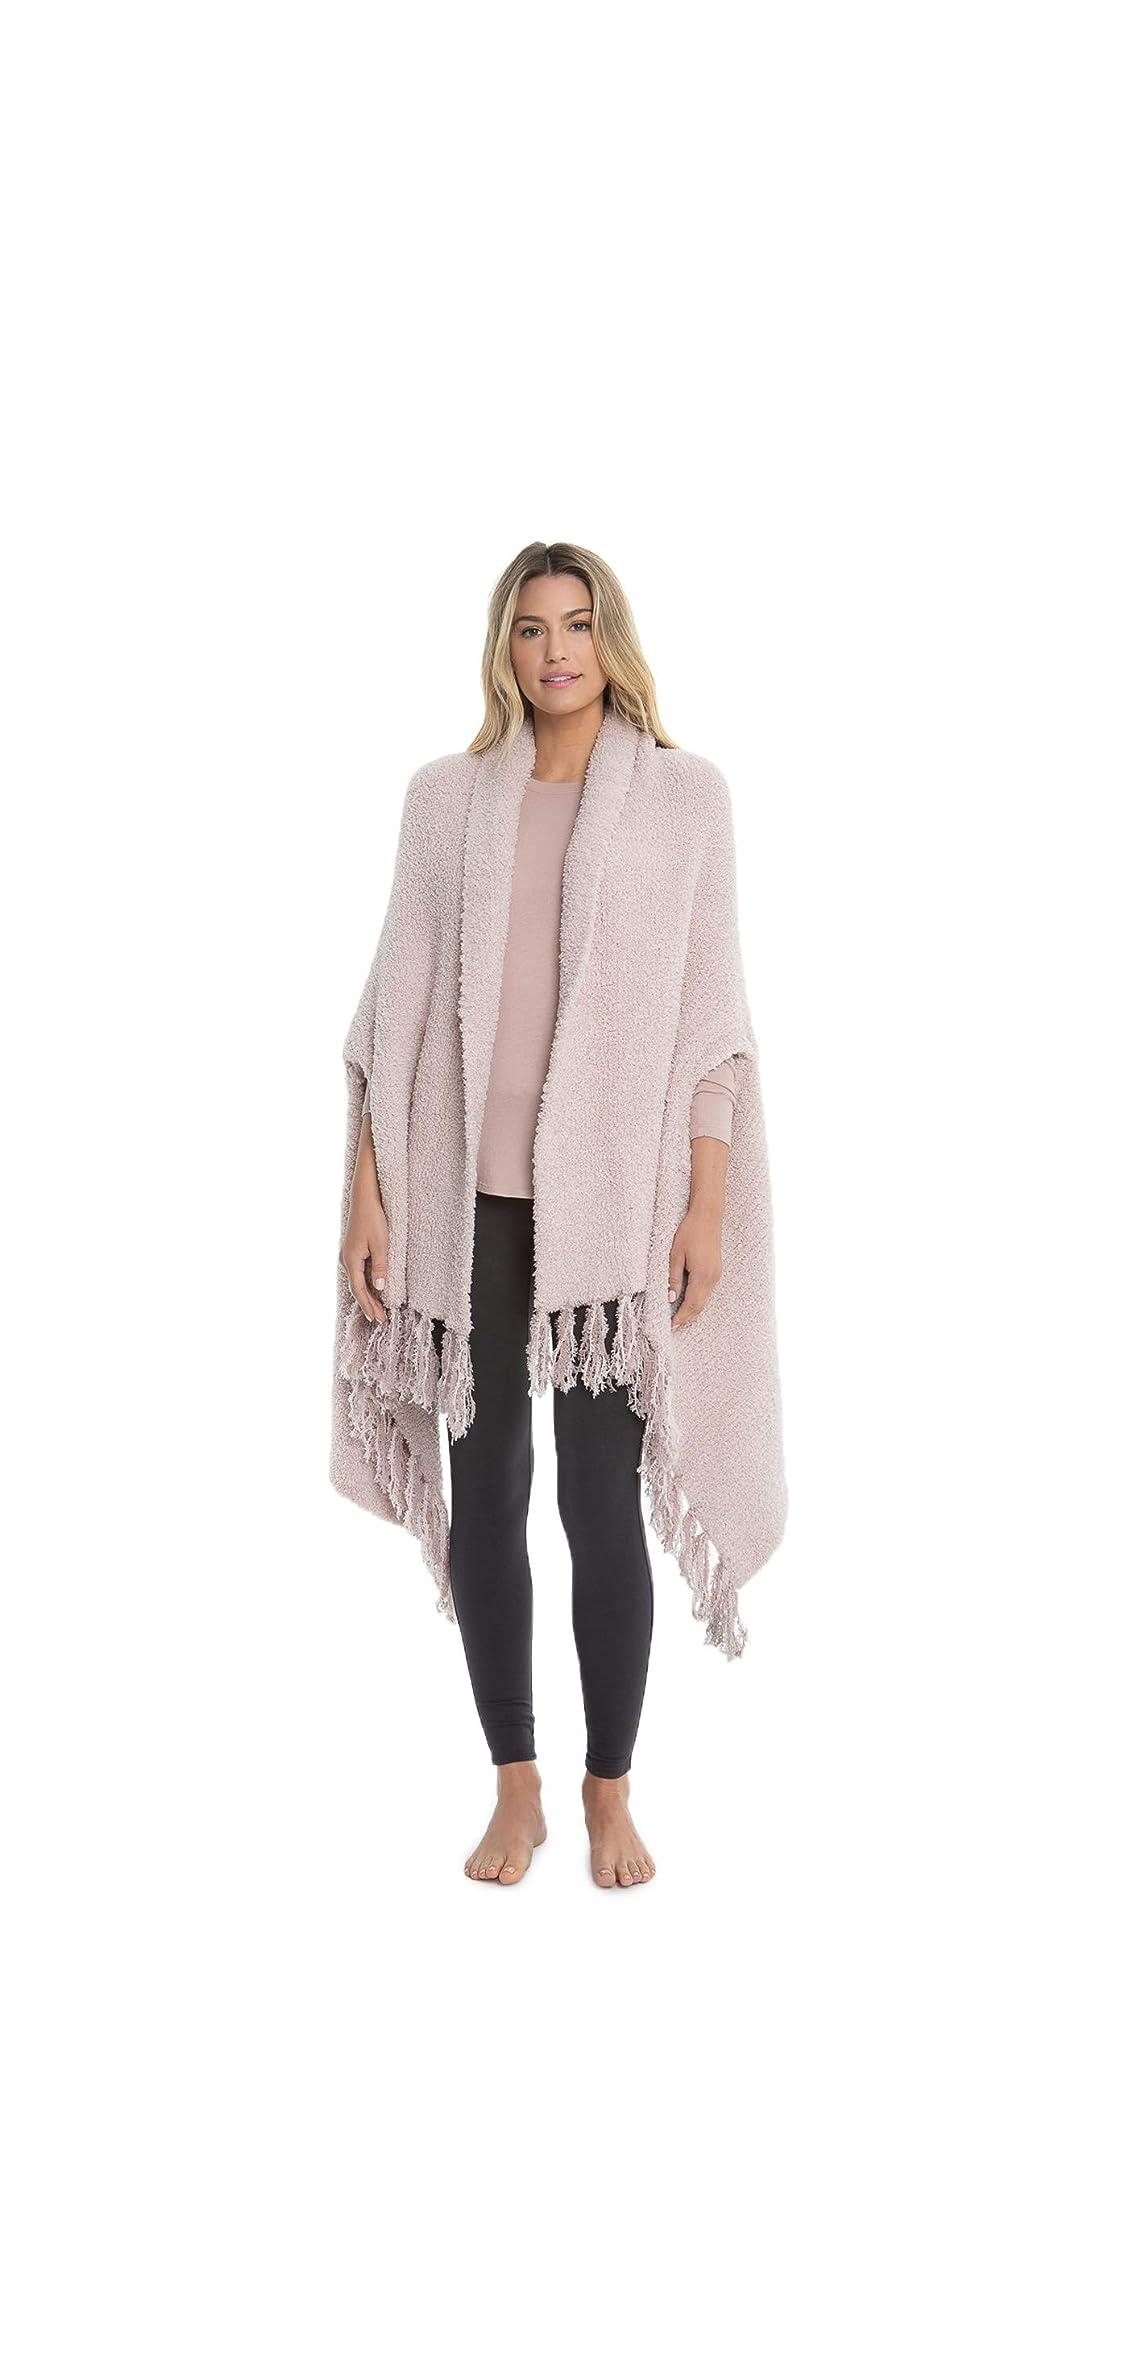 Cozychic Luxe Laguna Wrap, Oversized Sweaters